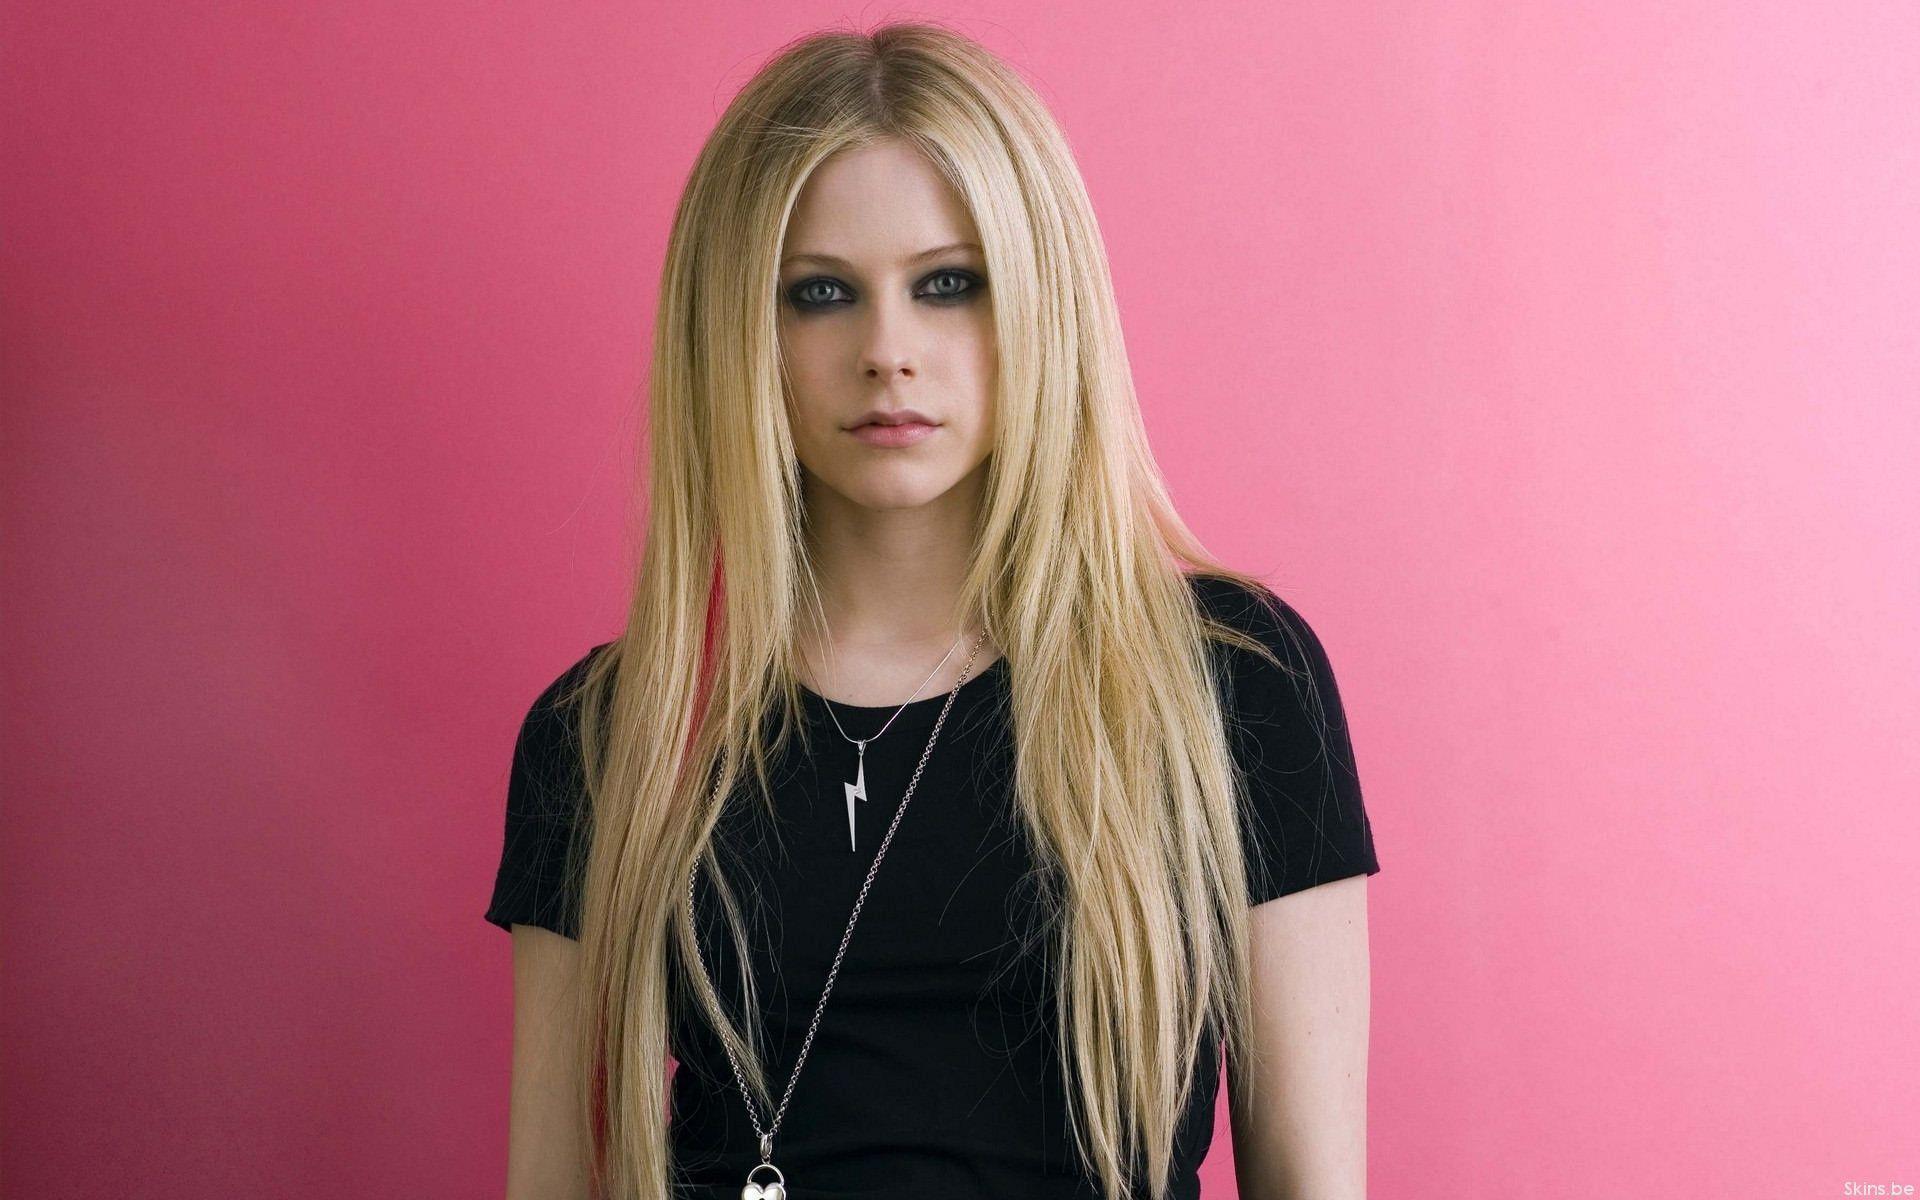 Avril Lavigne 1 Wallpapers: Avril Lavigne Backgrounds